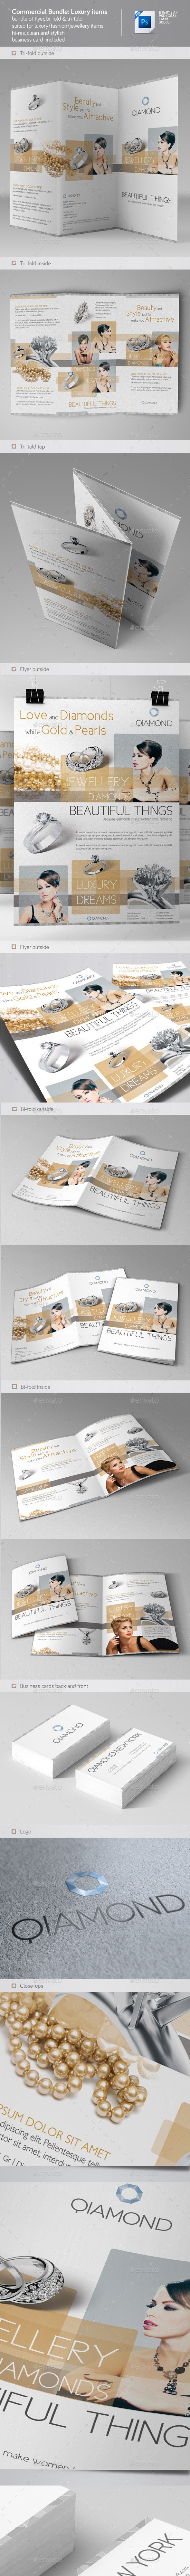 Commercial Flyer Bundle 1: Luxury Items - Commerce Flyers